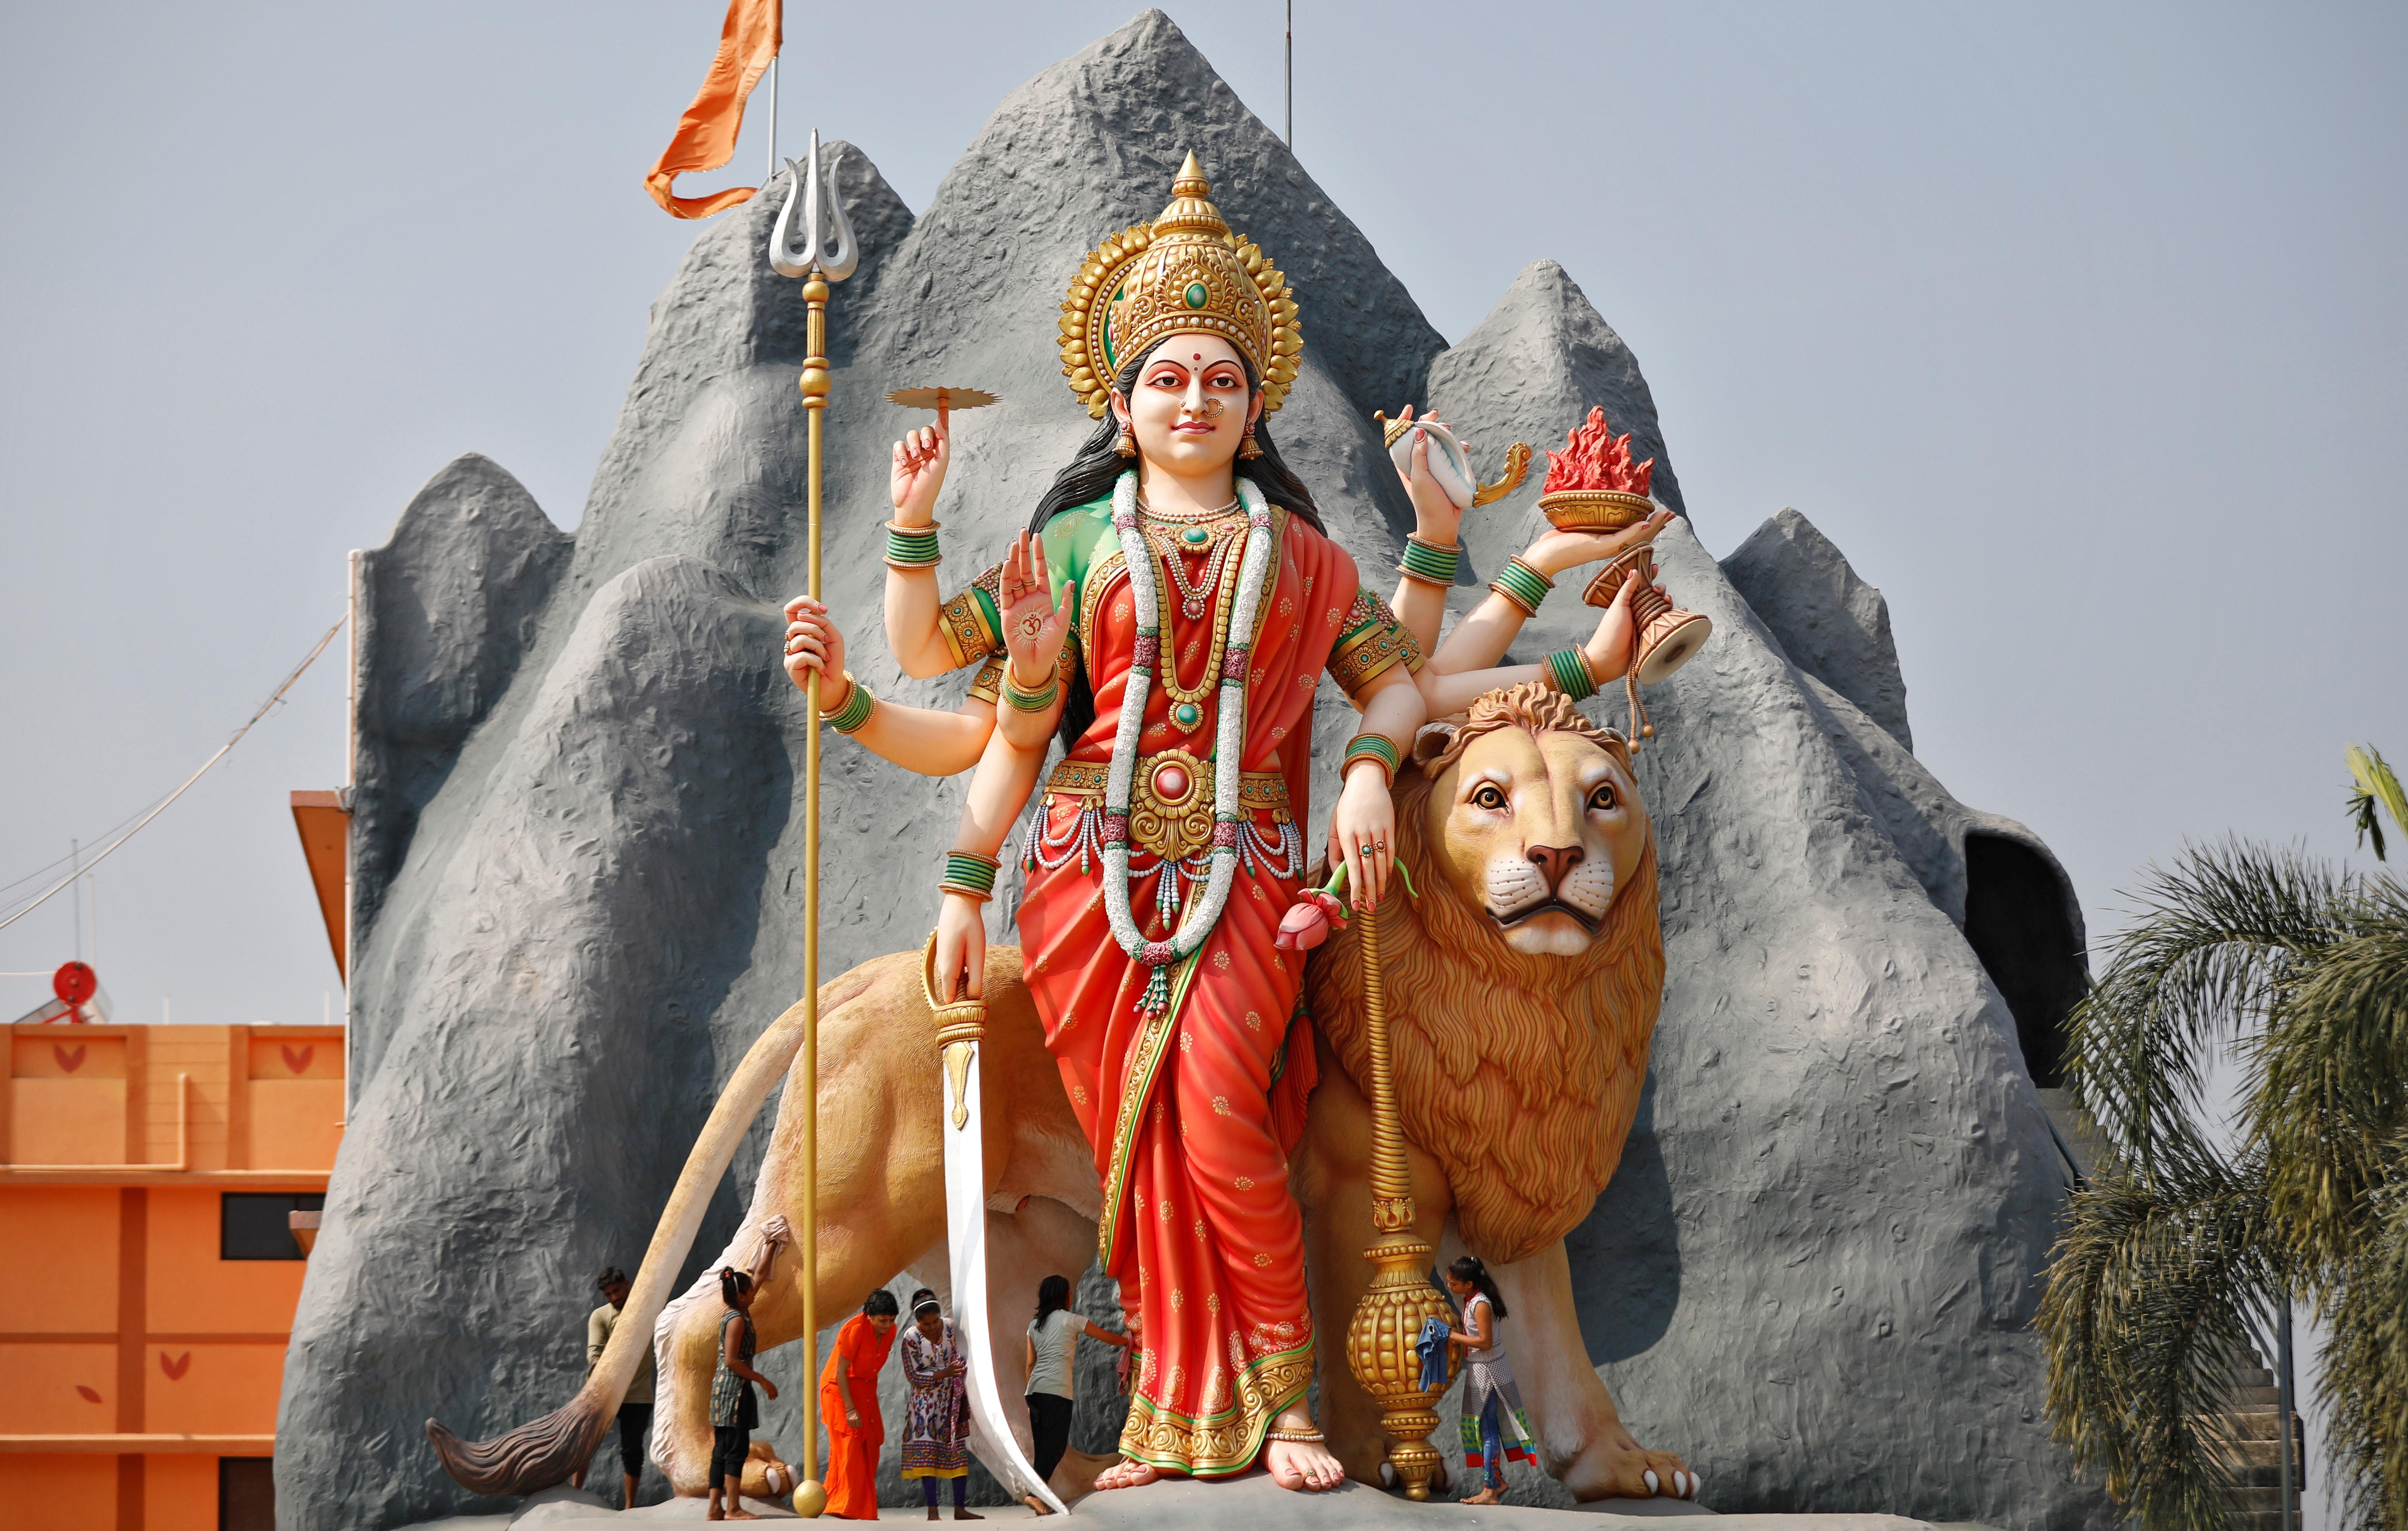 Girls clean a 34-foot tall idol of Hindu goddess Durga at a temple in Gandhinagar Gujarat